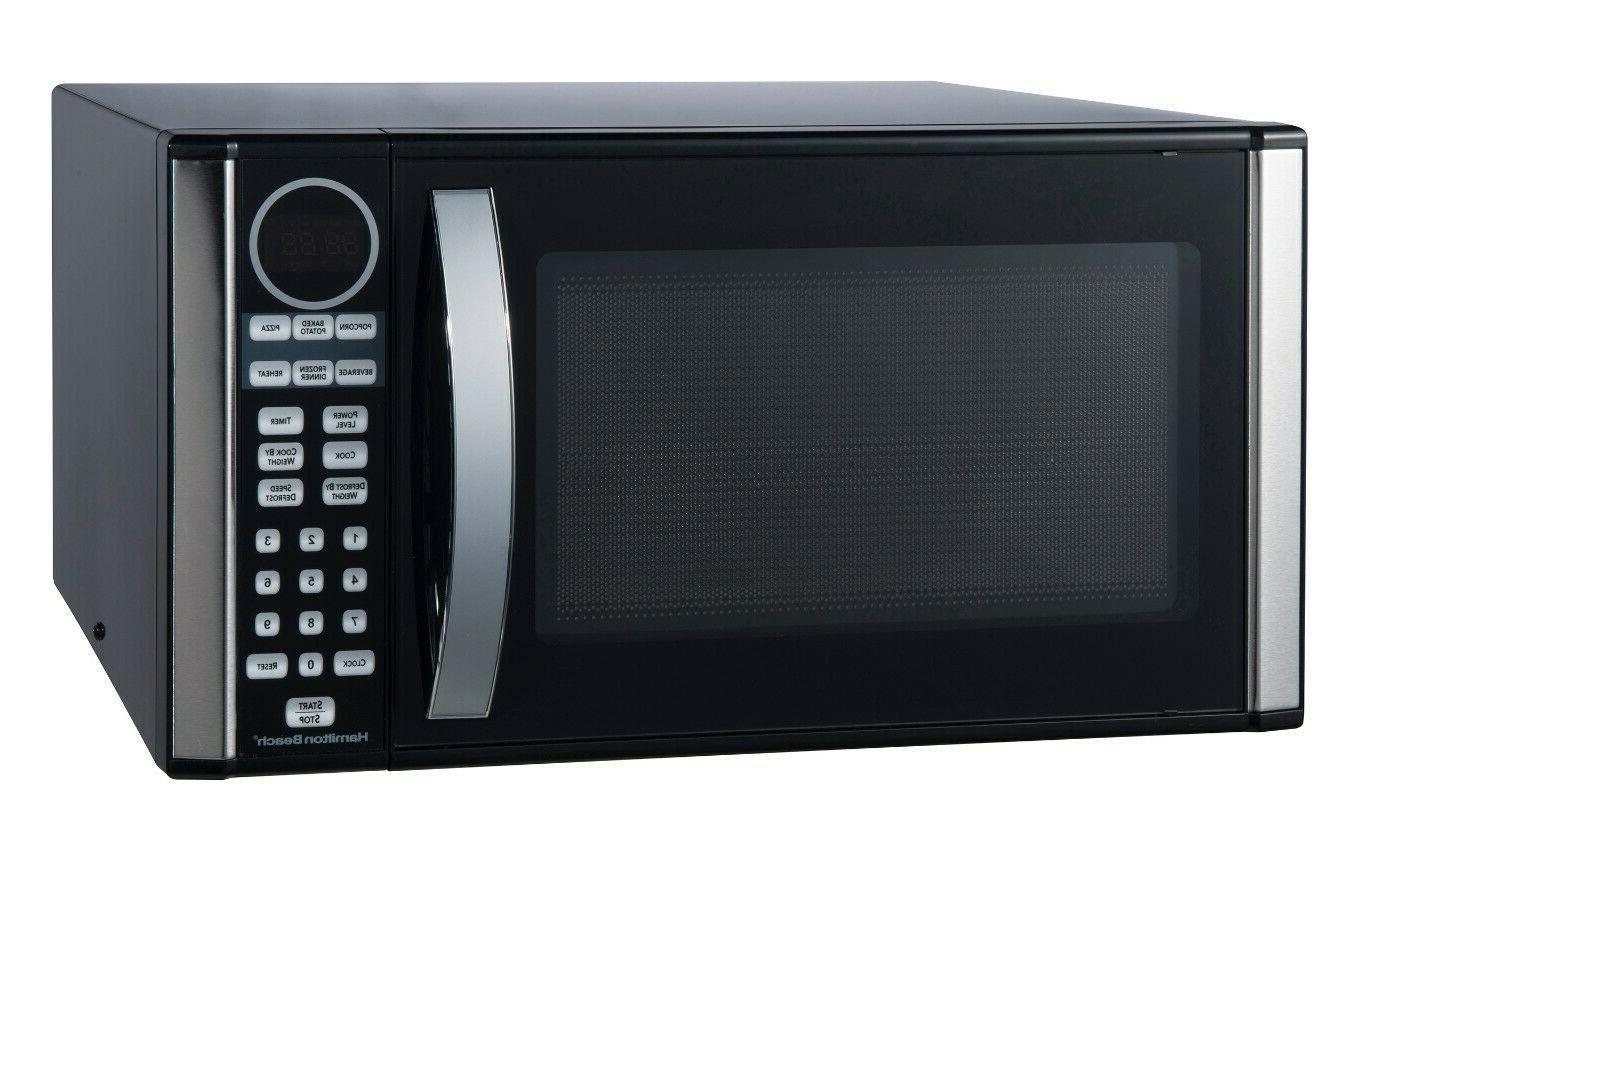 Hamilton Microwave Oven Black Stainless Steel Display